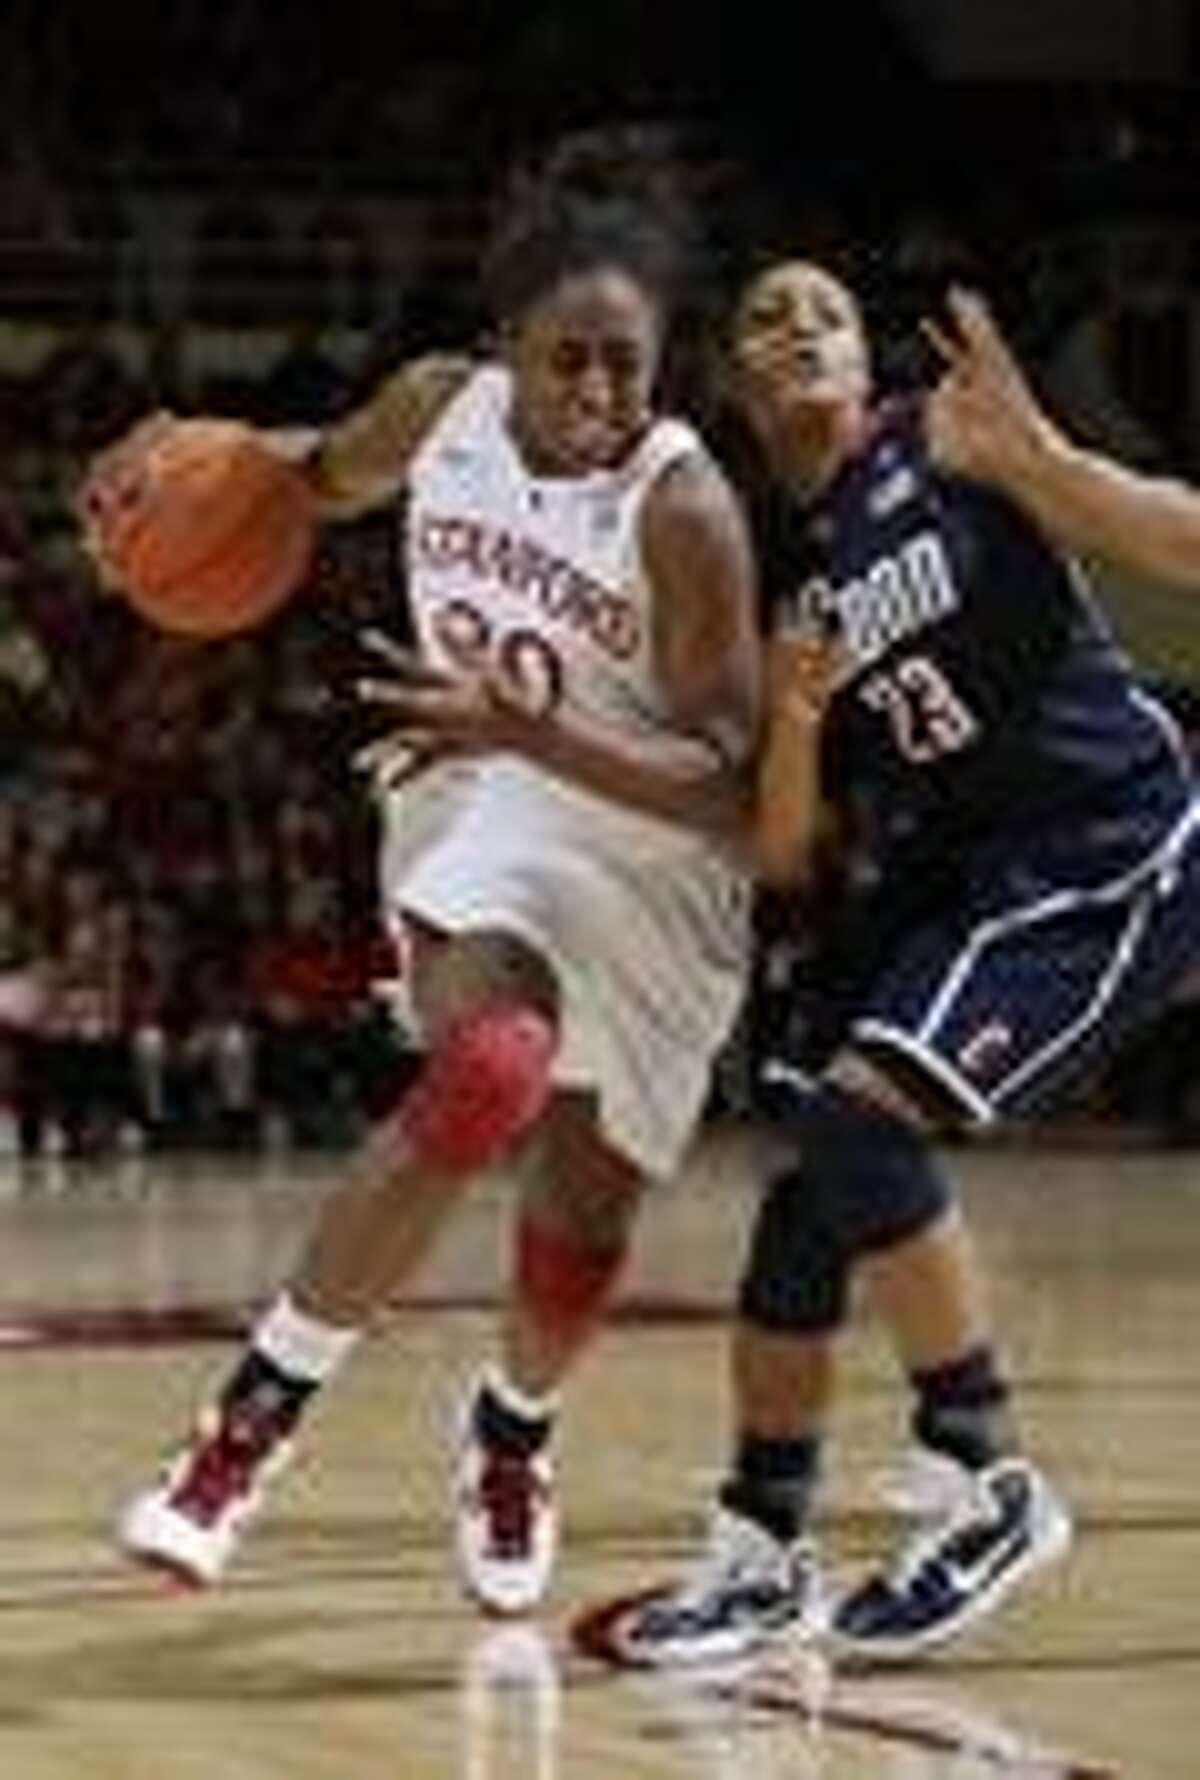 an NCAA college basketball game in Stanford, Calif., Thursday, Dec. 30, 2010. Stanford upset Connecticut 78-59. (AP Photo/Paul Sakuma)